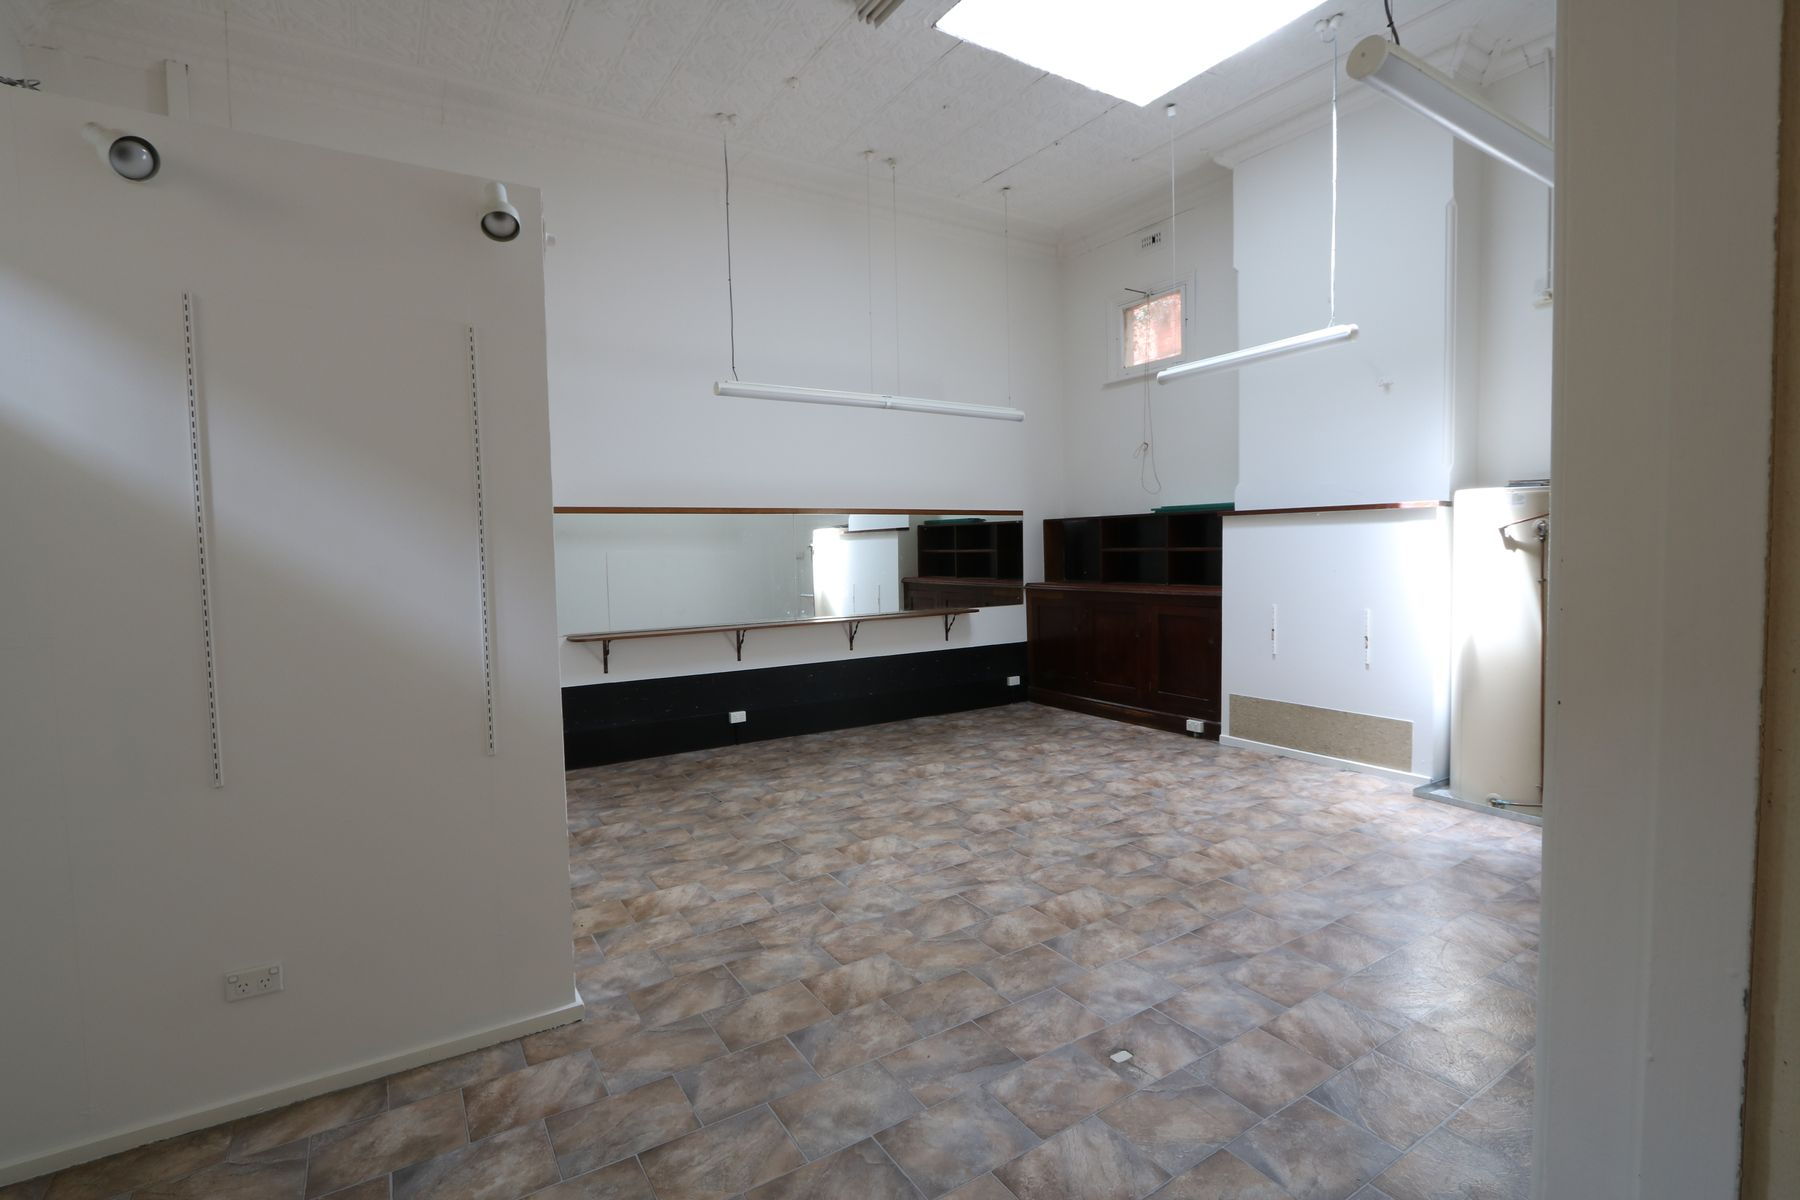 180A Allan Street - Rodney Chambers, Kyabram, VIC 3620